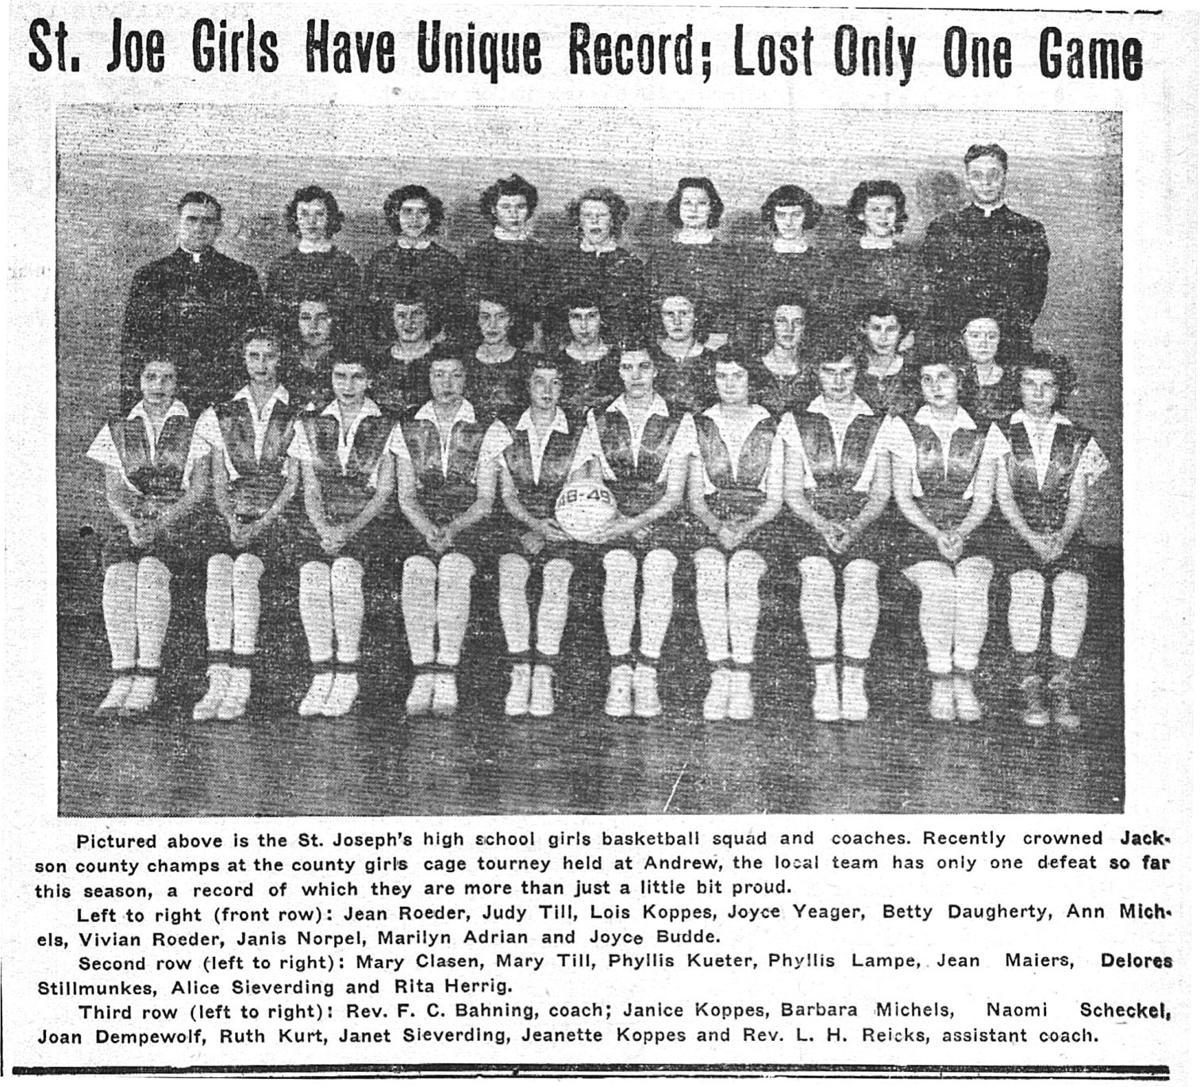 1949 basketball team